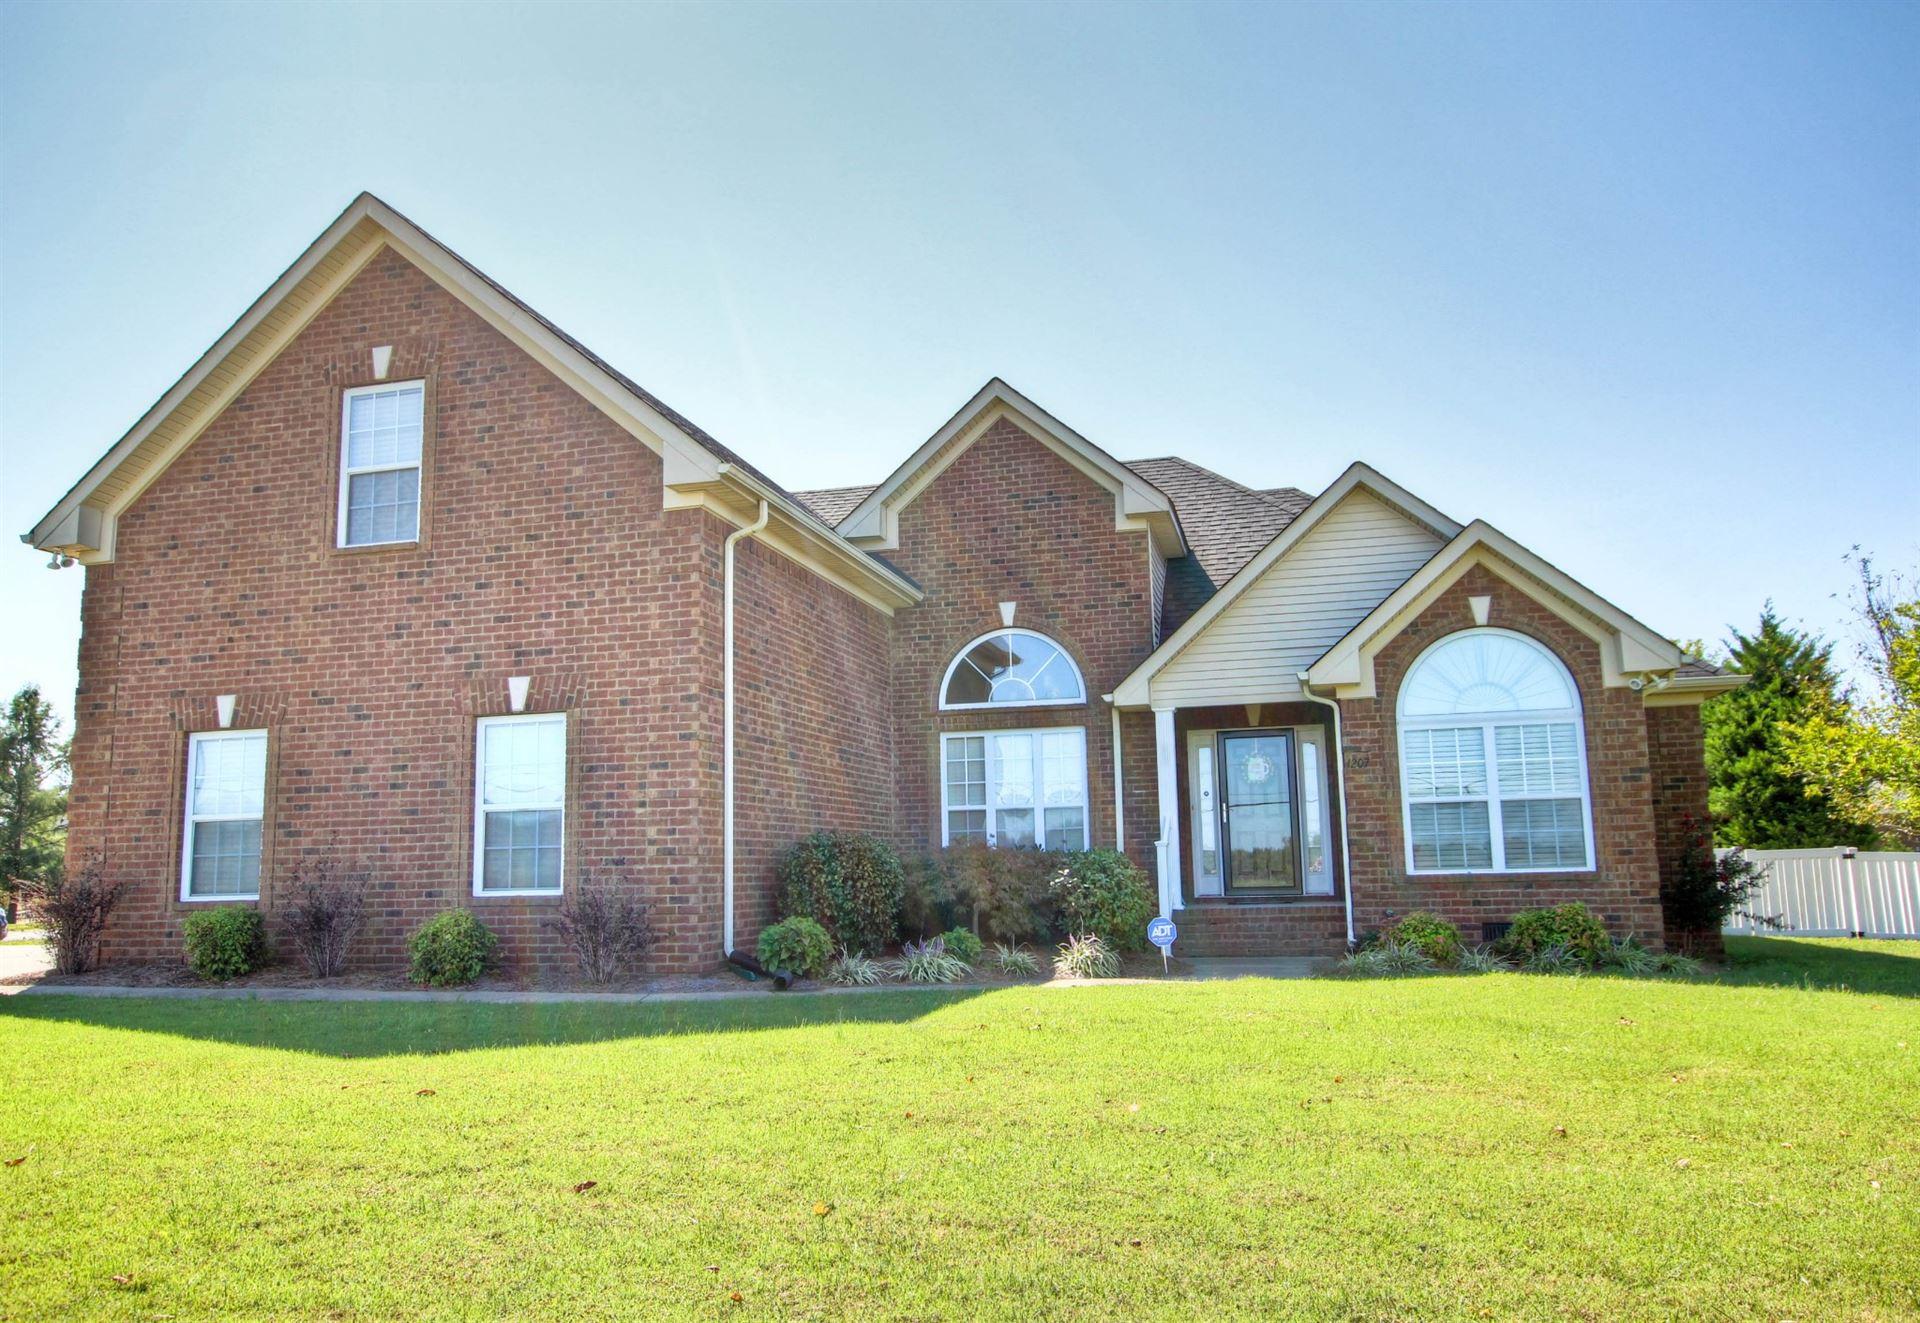 1207 Swamp Leanna Rd, Murfreesboro, TN 37129 - MLS#: 2191353